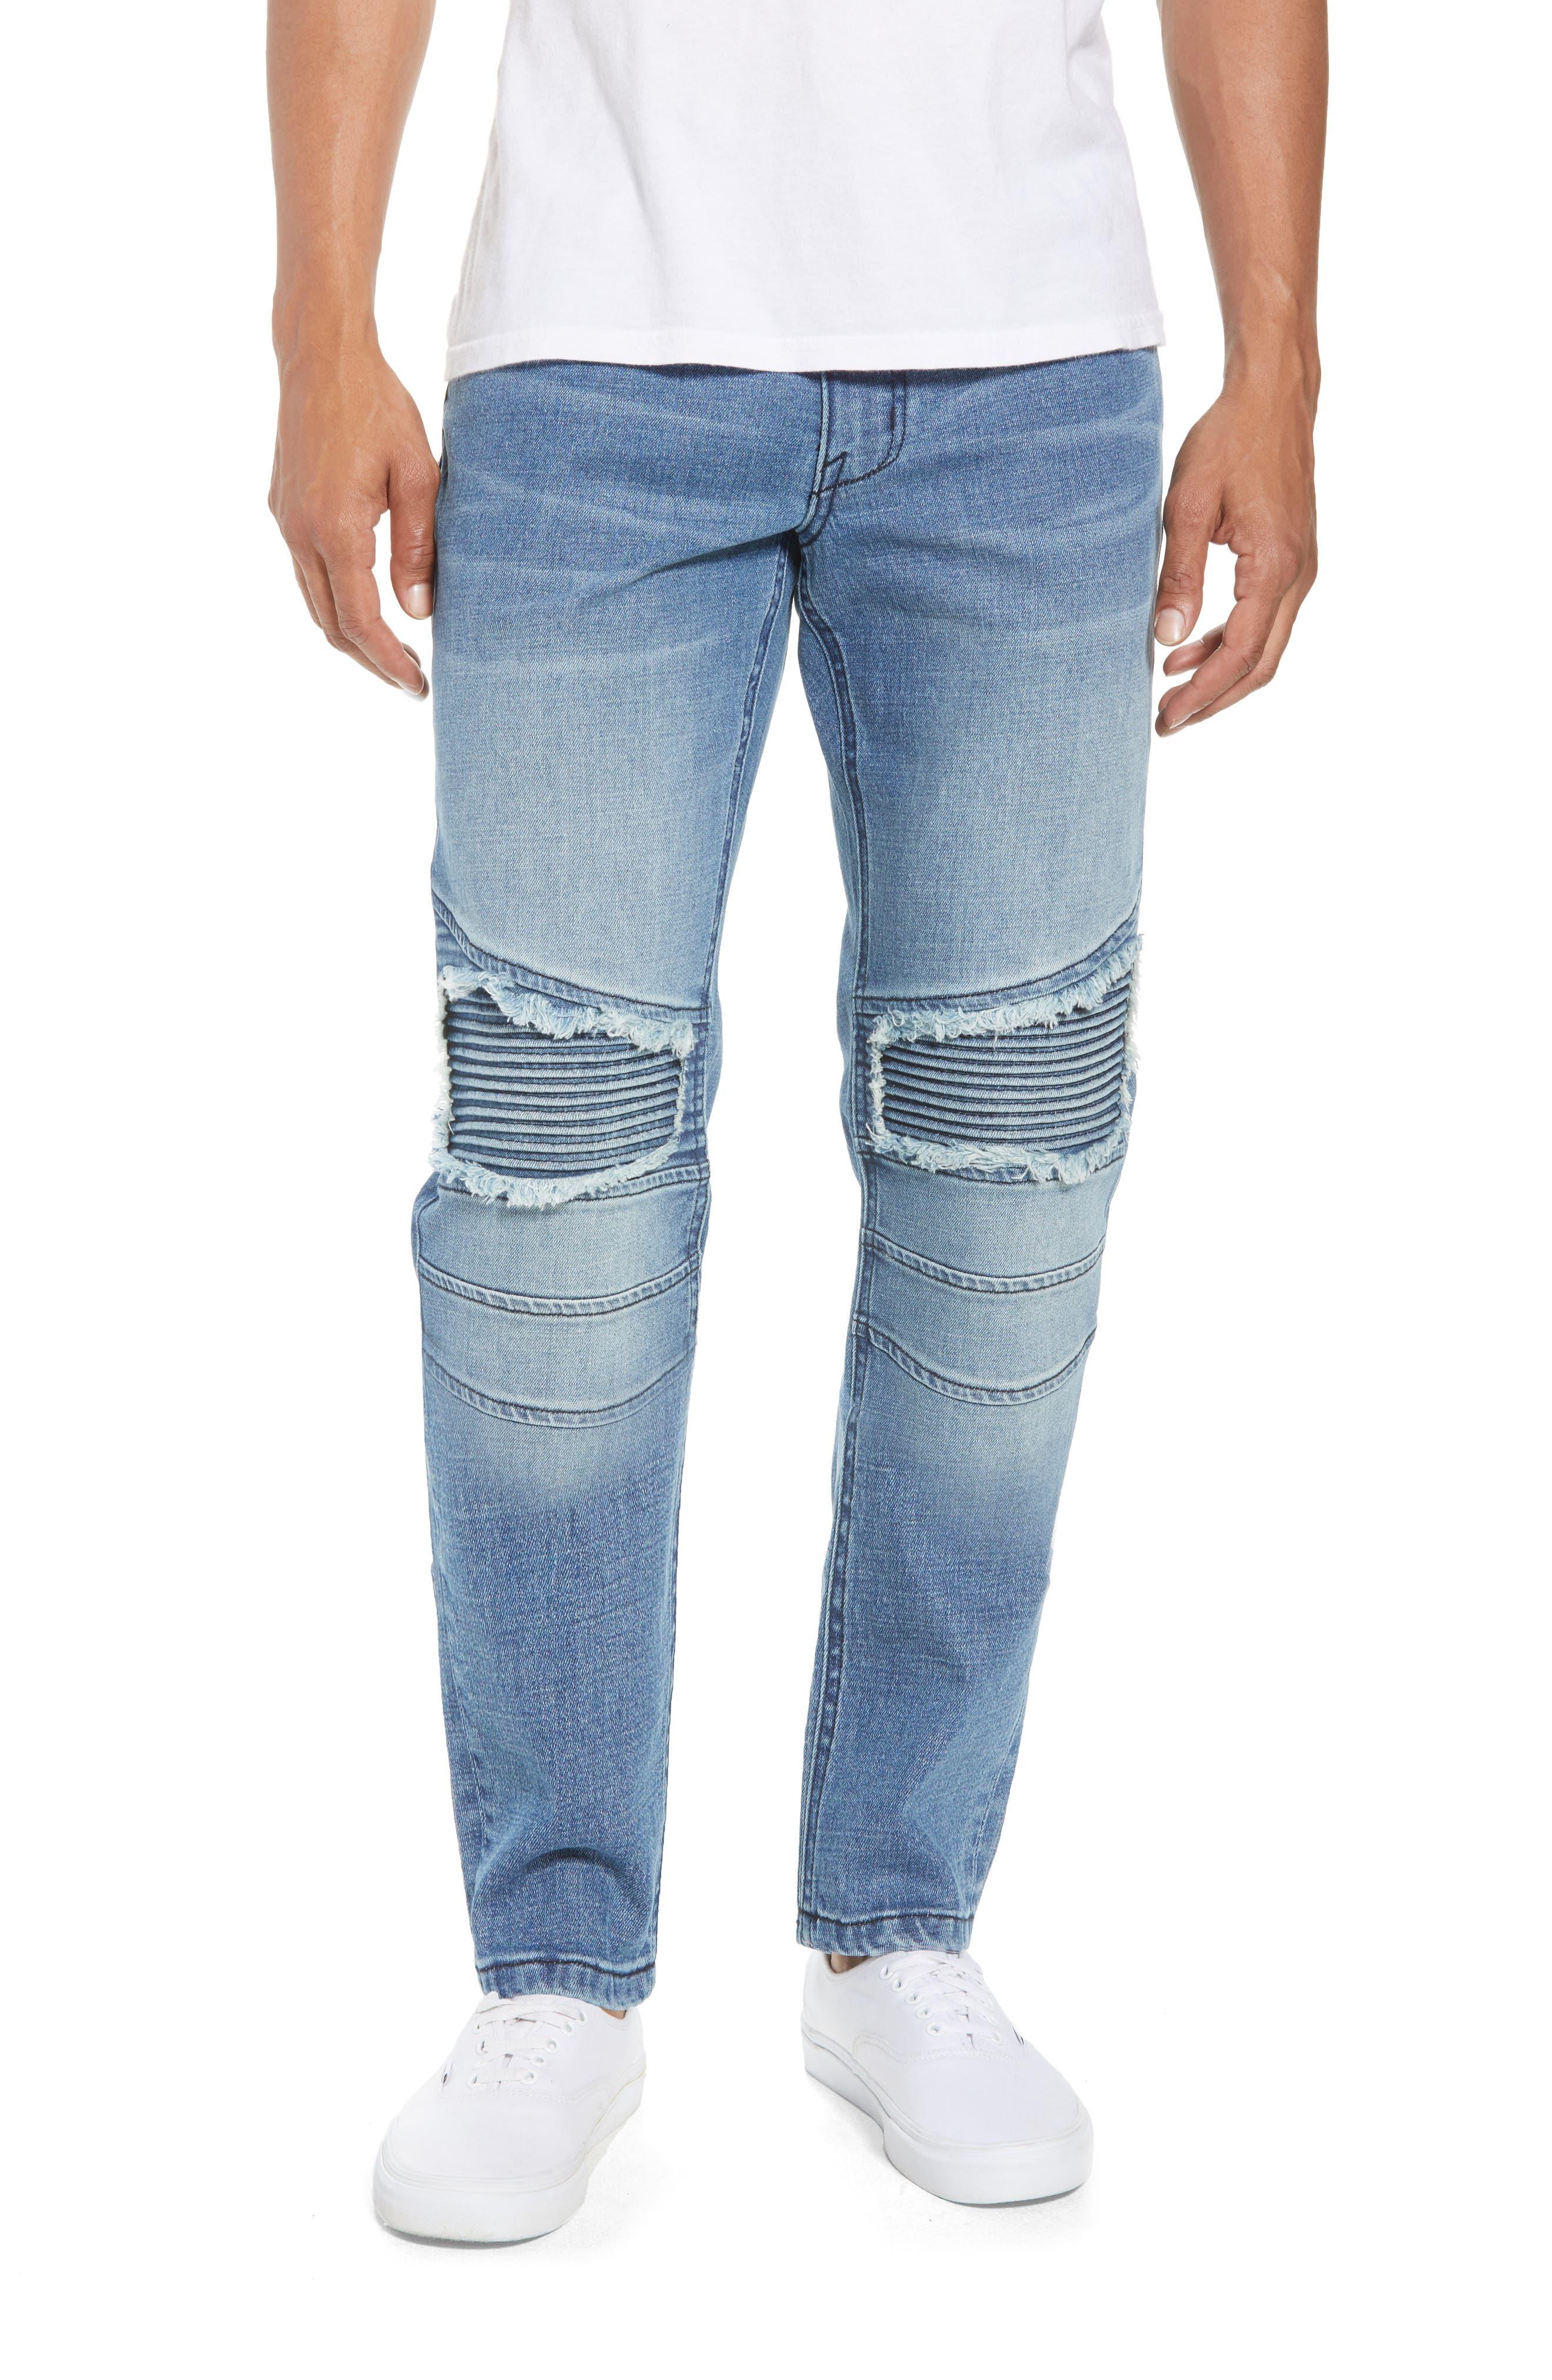 Skinny Moto Jeans,                             Main thumbnail 1, color,                             BLUE RIVERS WASH